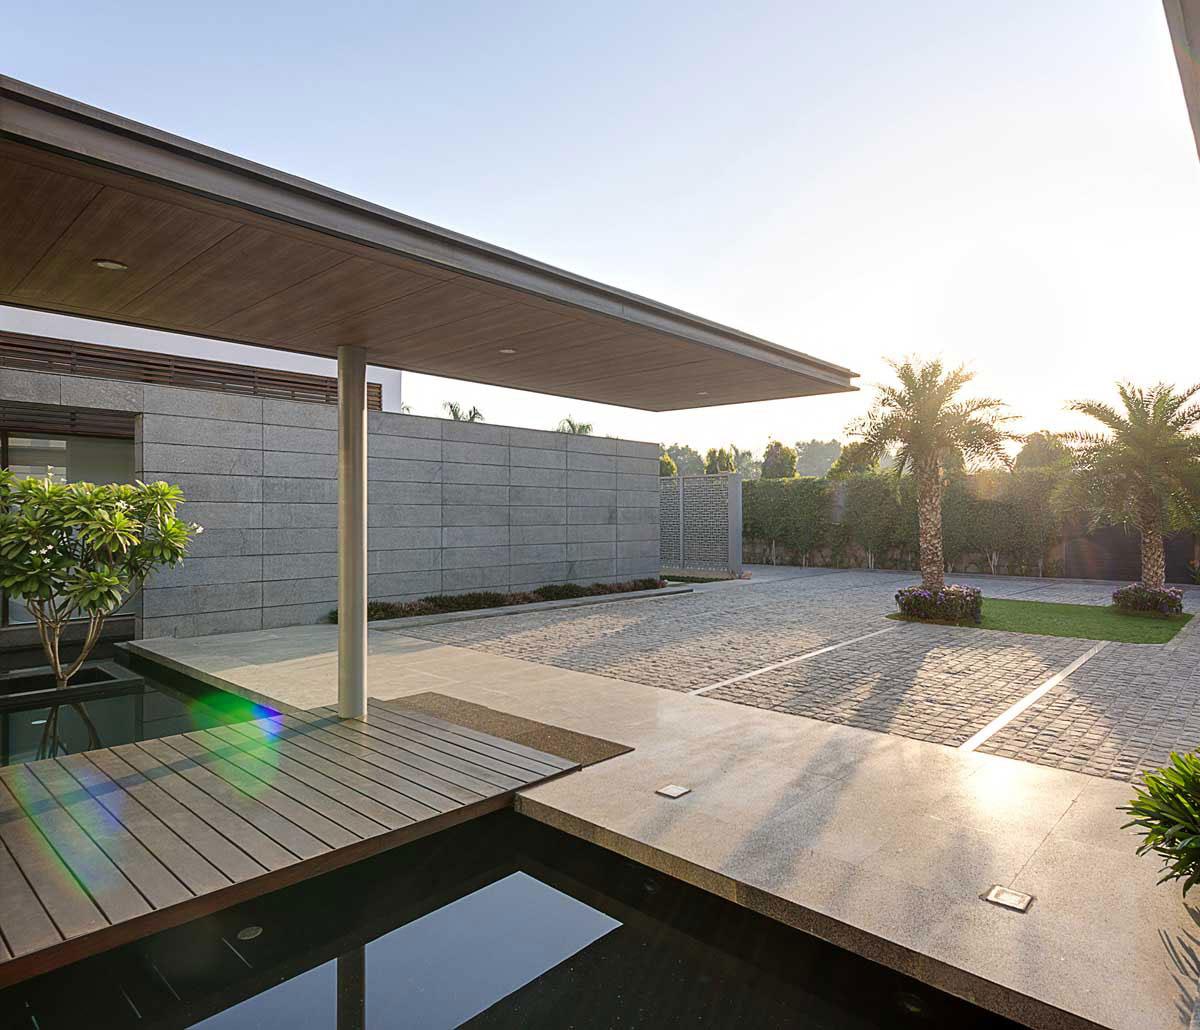 Luxurious center-court-villa-designed by-DADA-partners-2 Luxurious center-court-villa designed by-DADA-partners